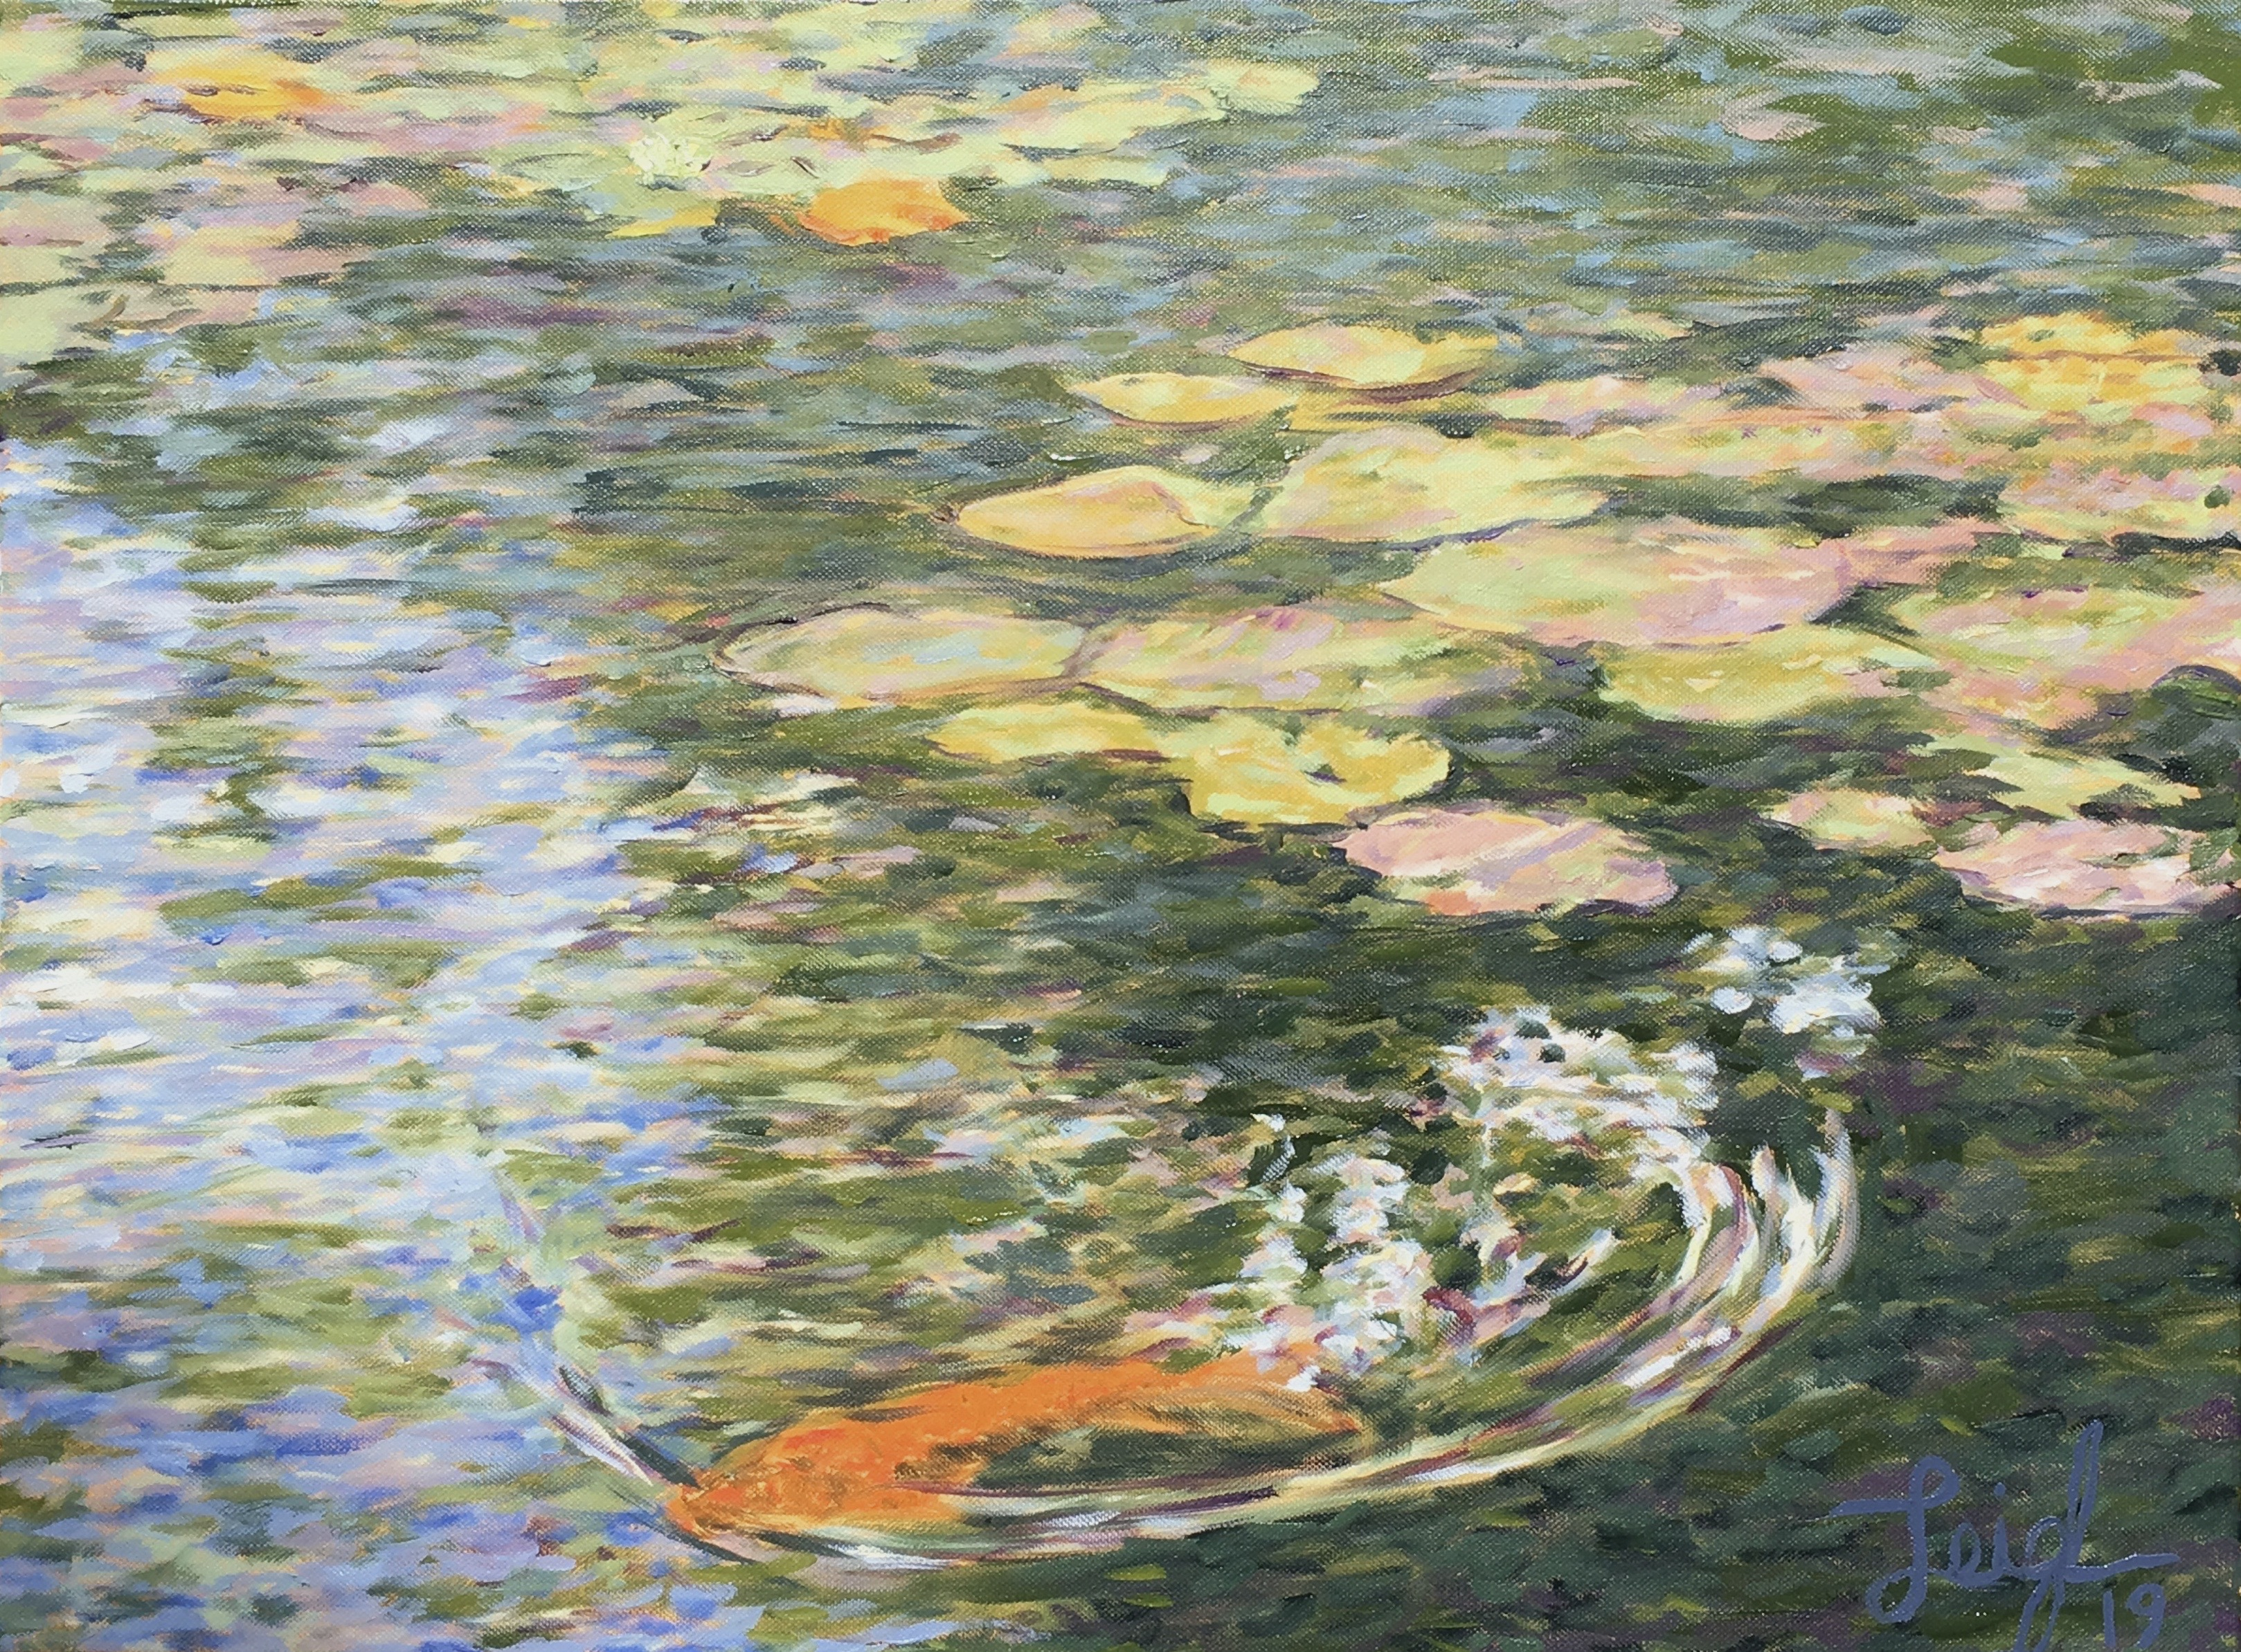 Water lilies in Balboa Park #4  ~  Amelia Eastman, La Jolla, CA 2019  •  24 x 18